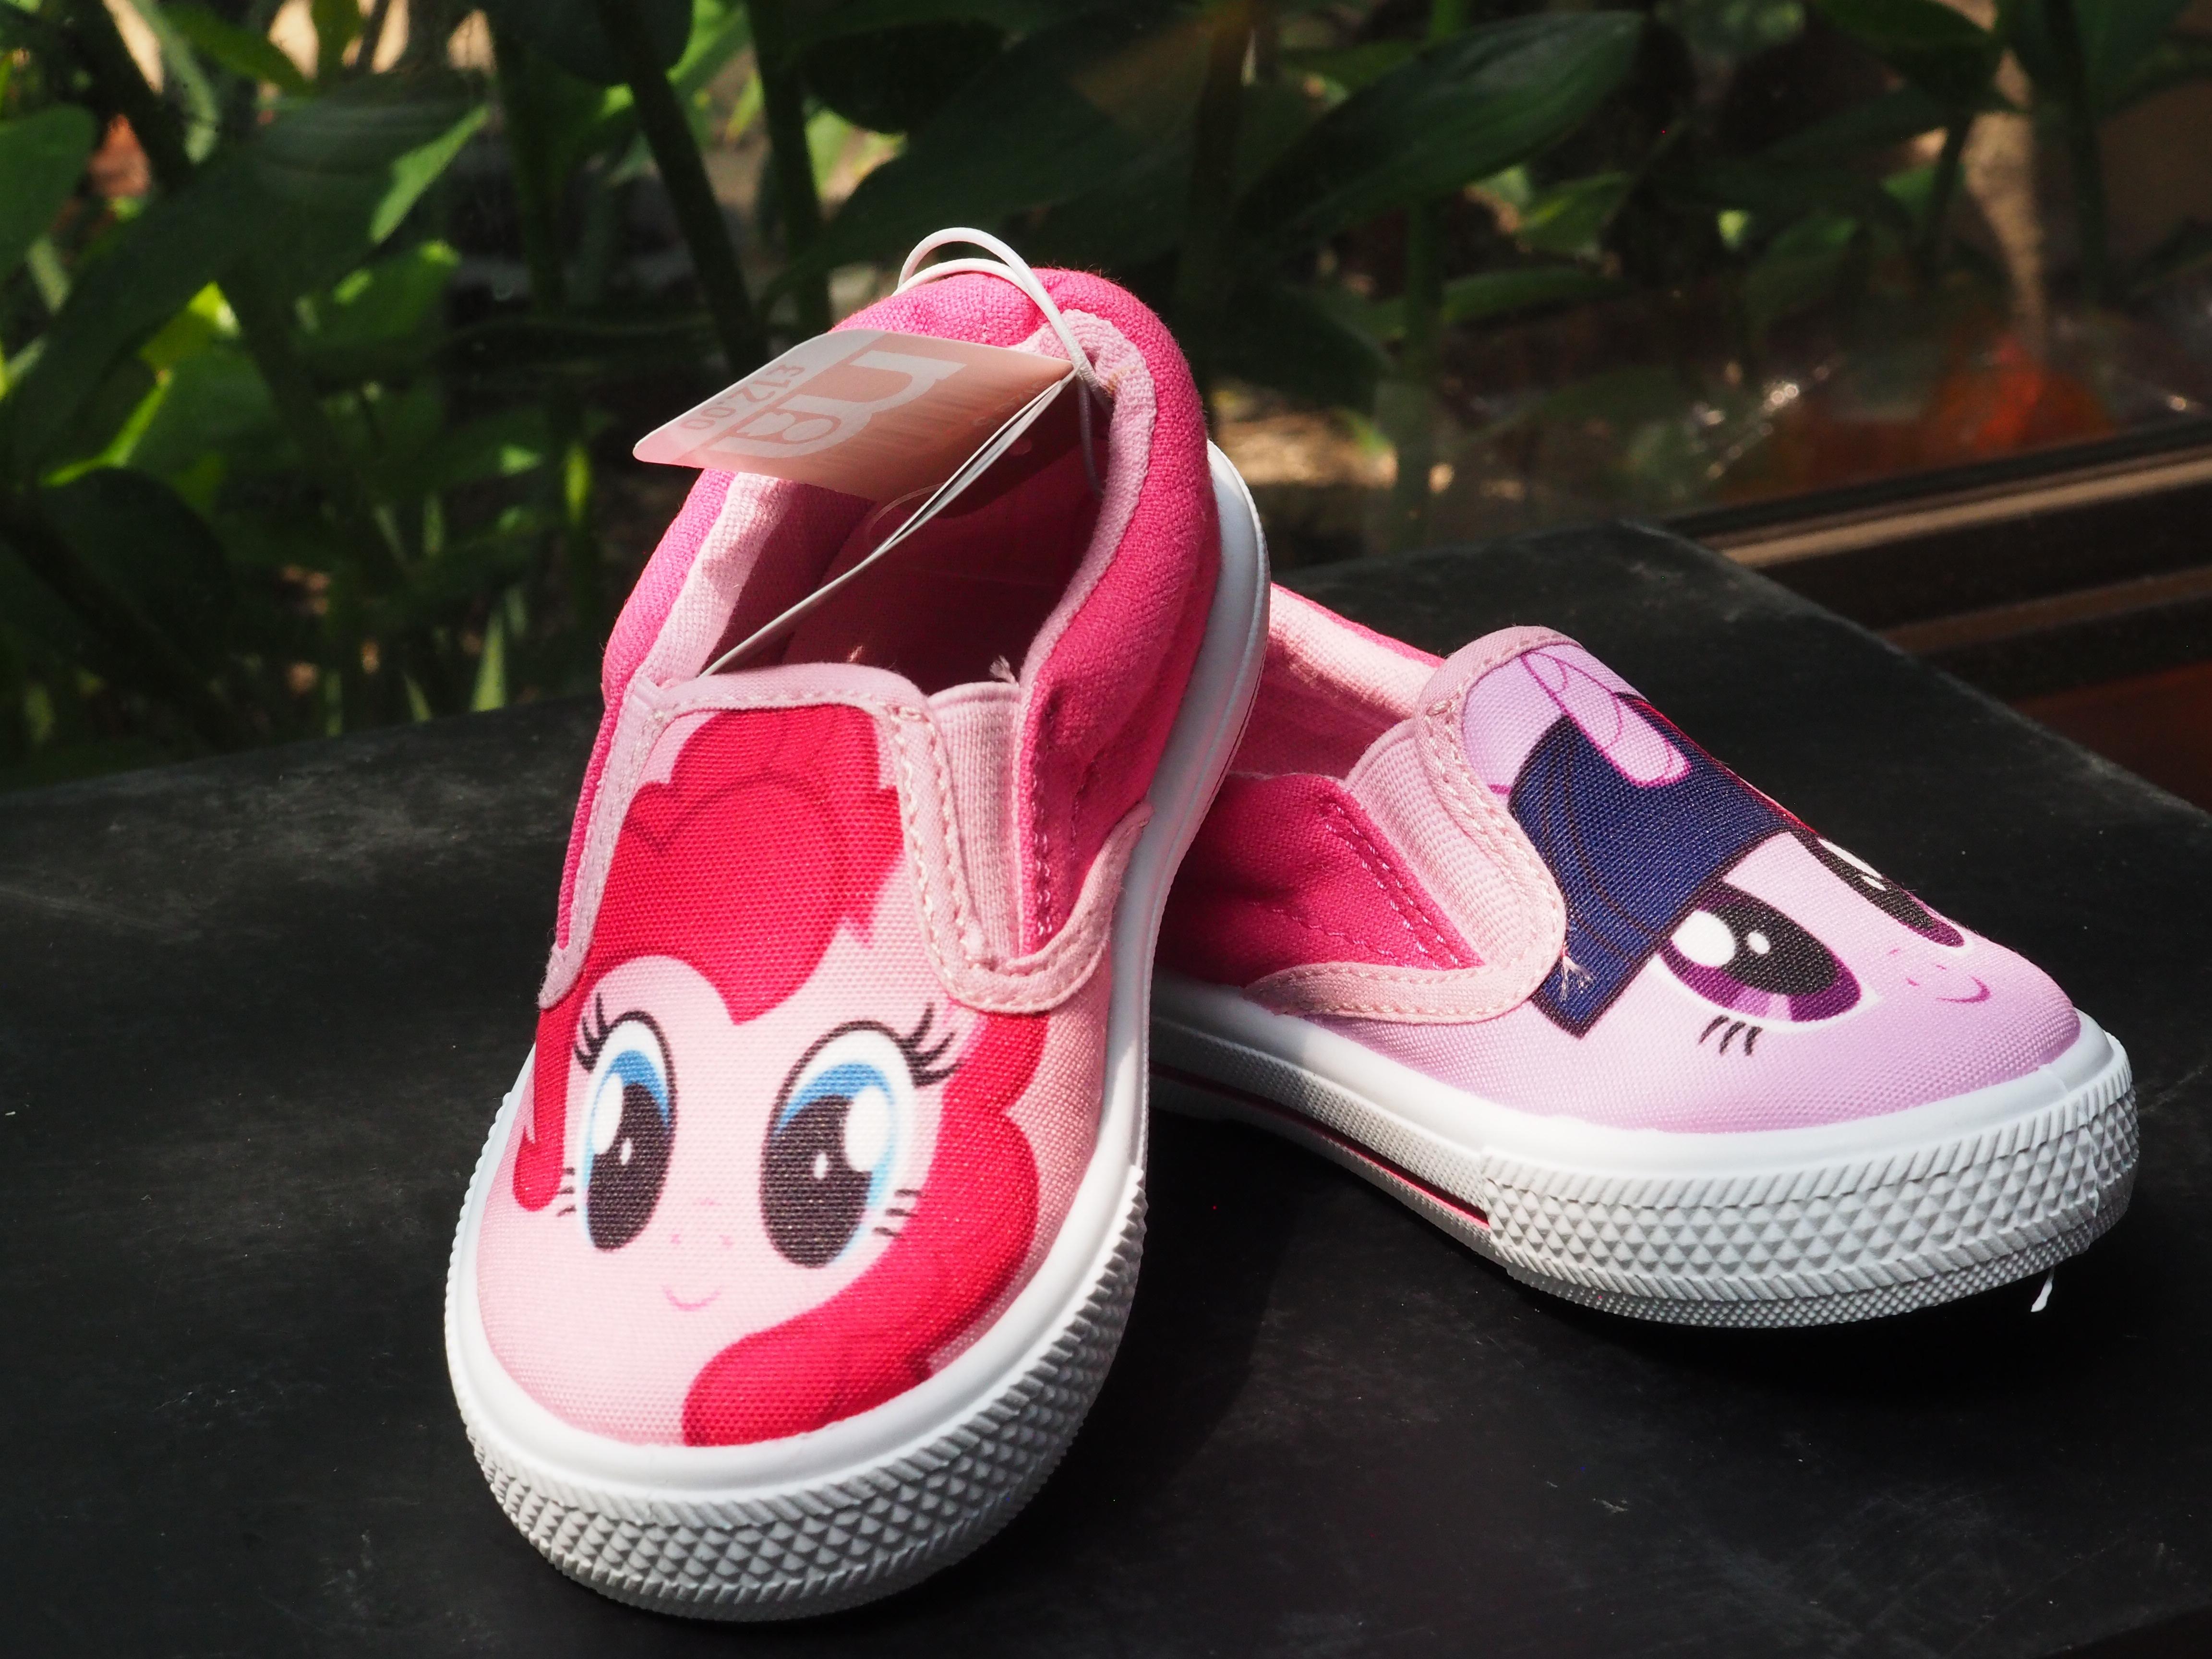 my Little Pony size 5